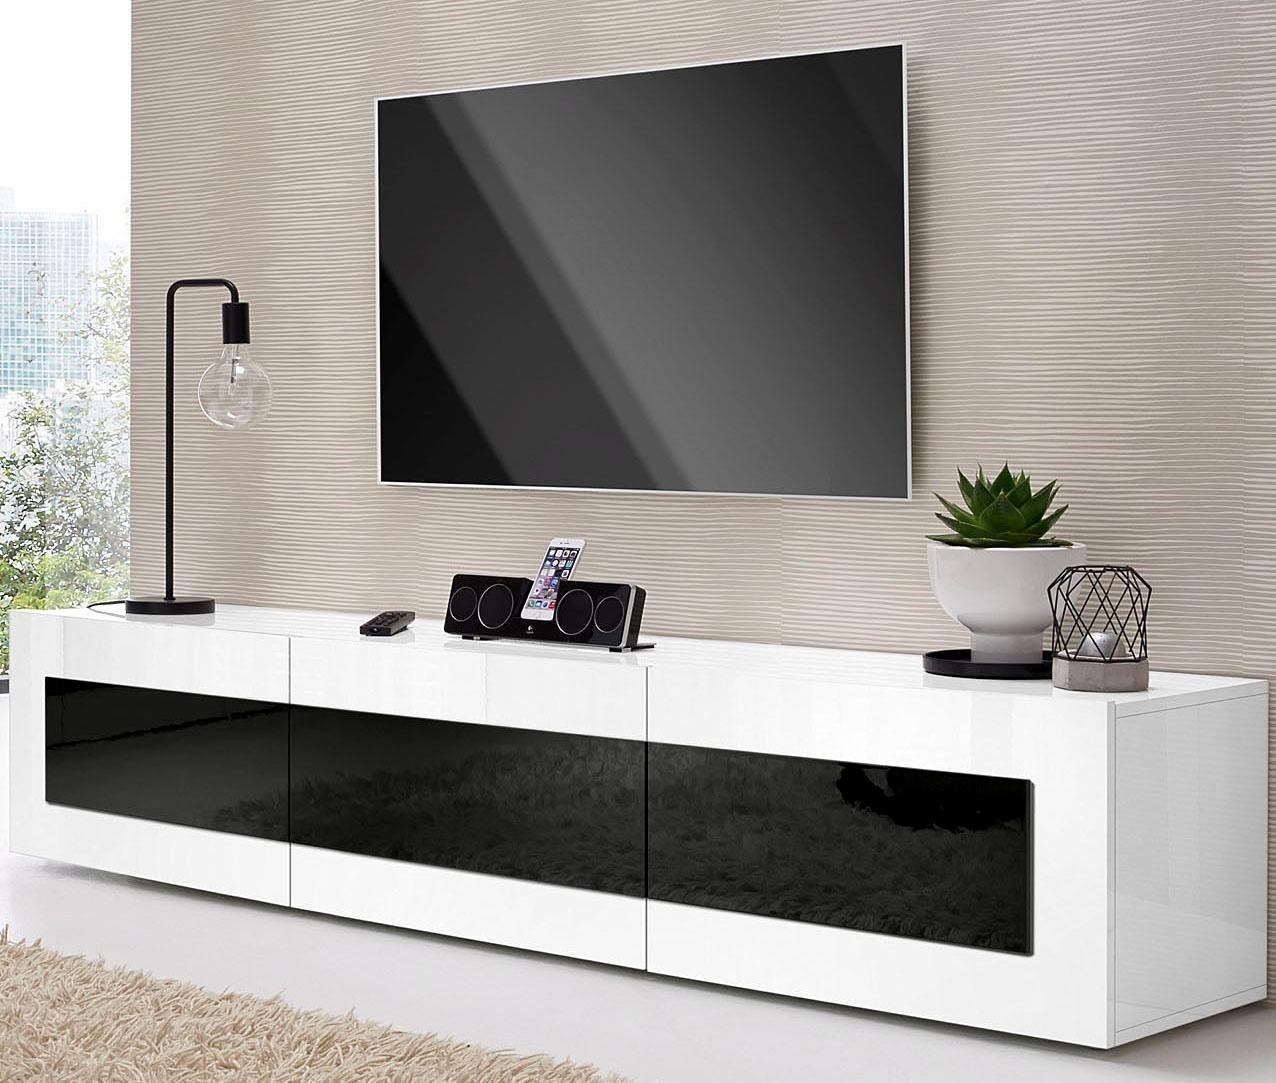 Tecnos TV-meubel, breedte 200 cm